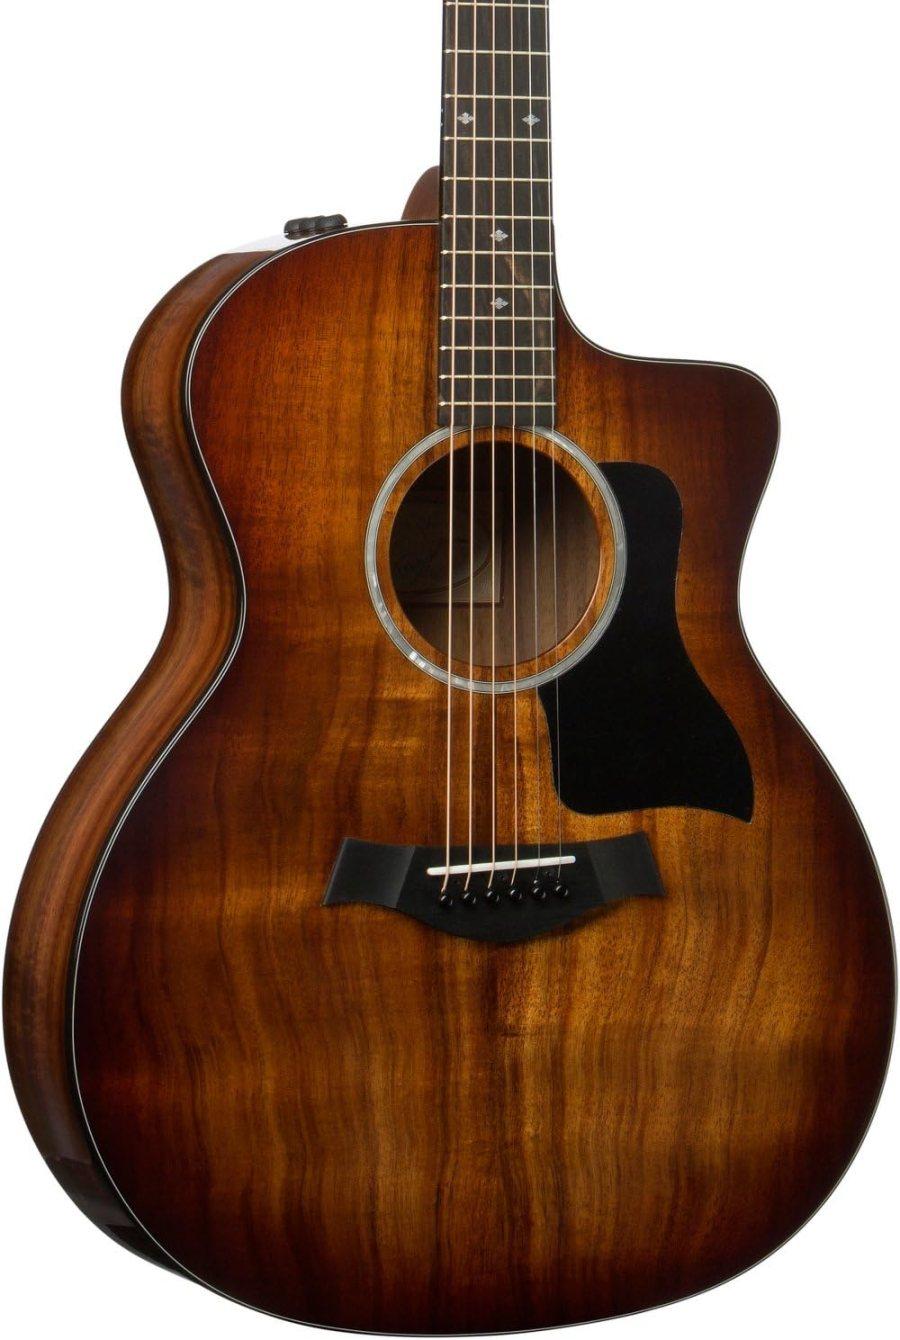 Top 3 Best Bluegrass Guitars - Most Value for money 2020 - 71E4cmSM9QL. AC SL1489